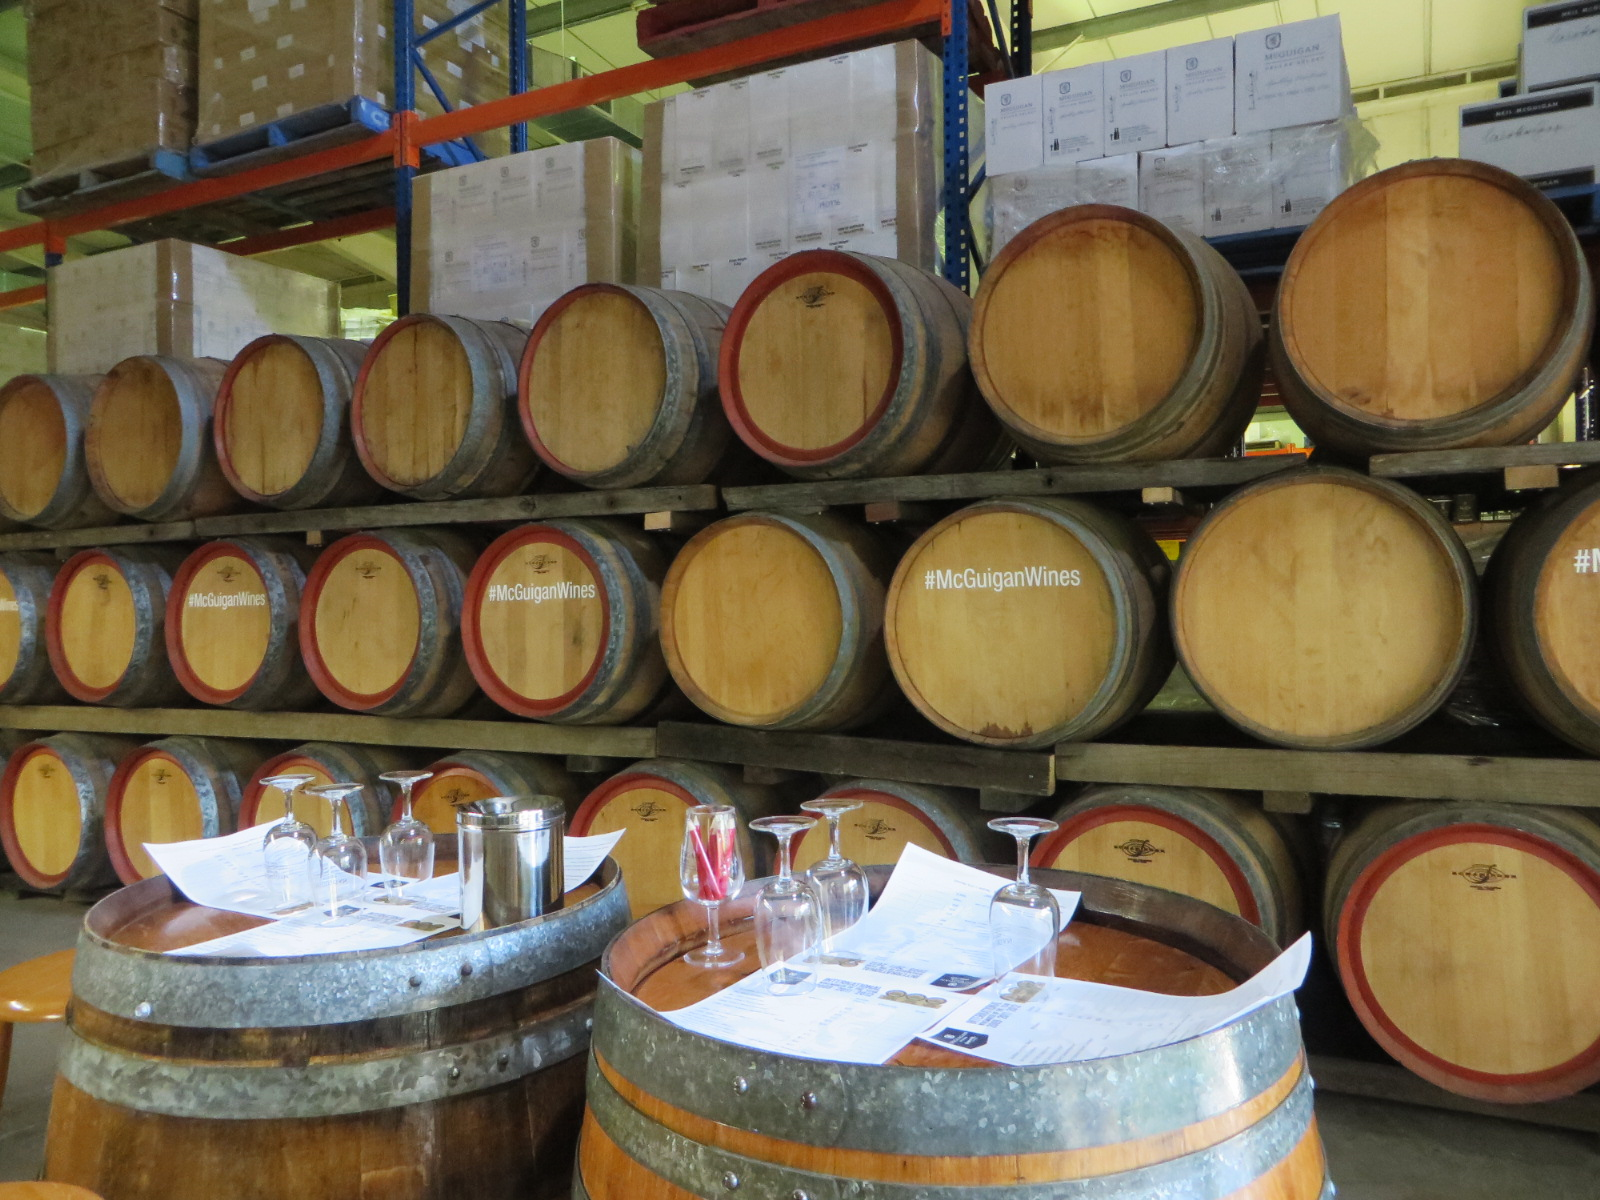 McGuigan Wines Australia